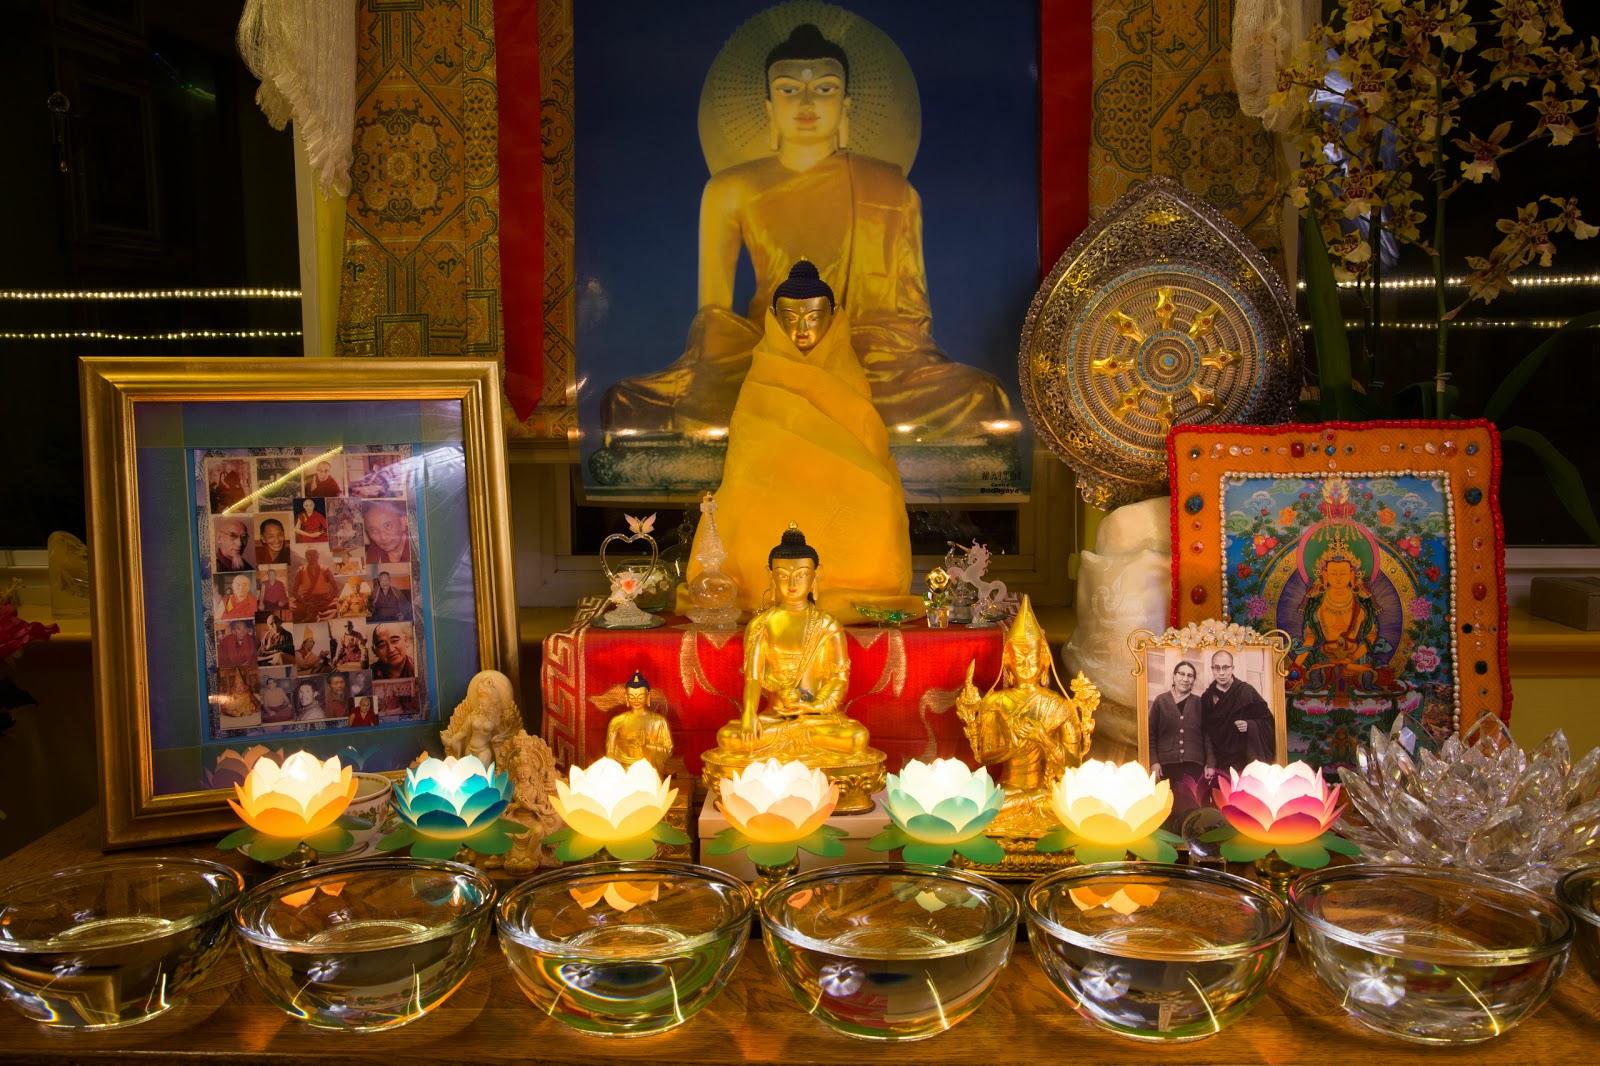 Altar in the Prajnaparamita room. Photo by Ven. Thubten Kunsang.